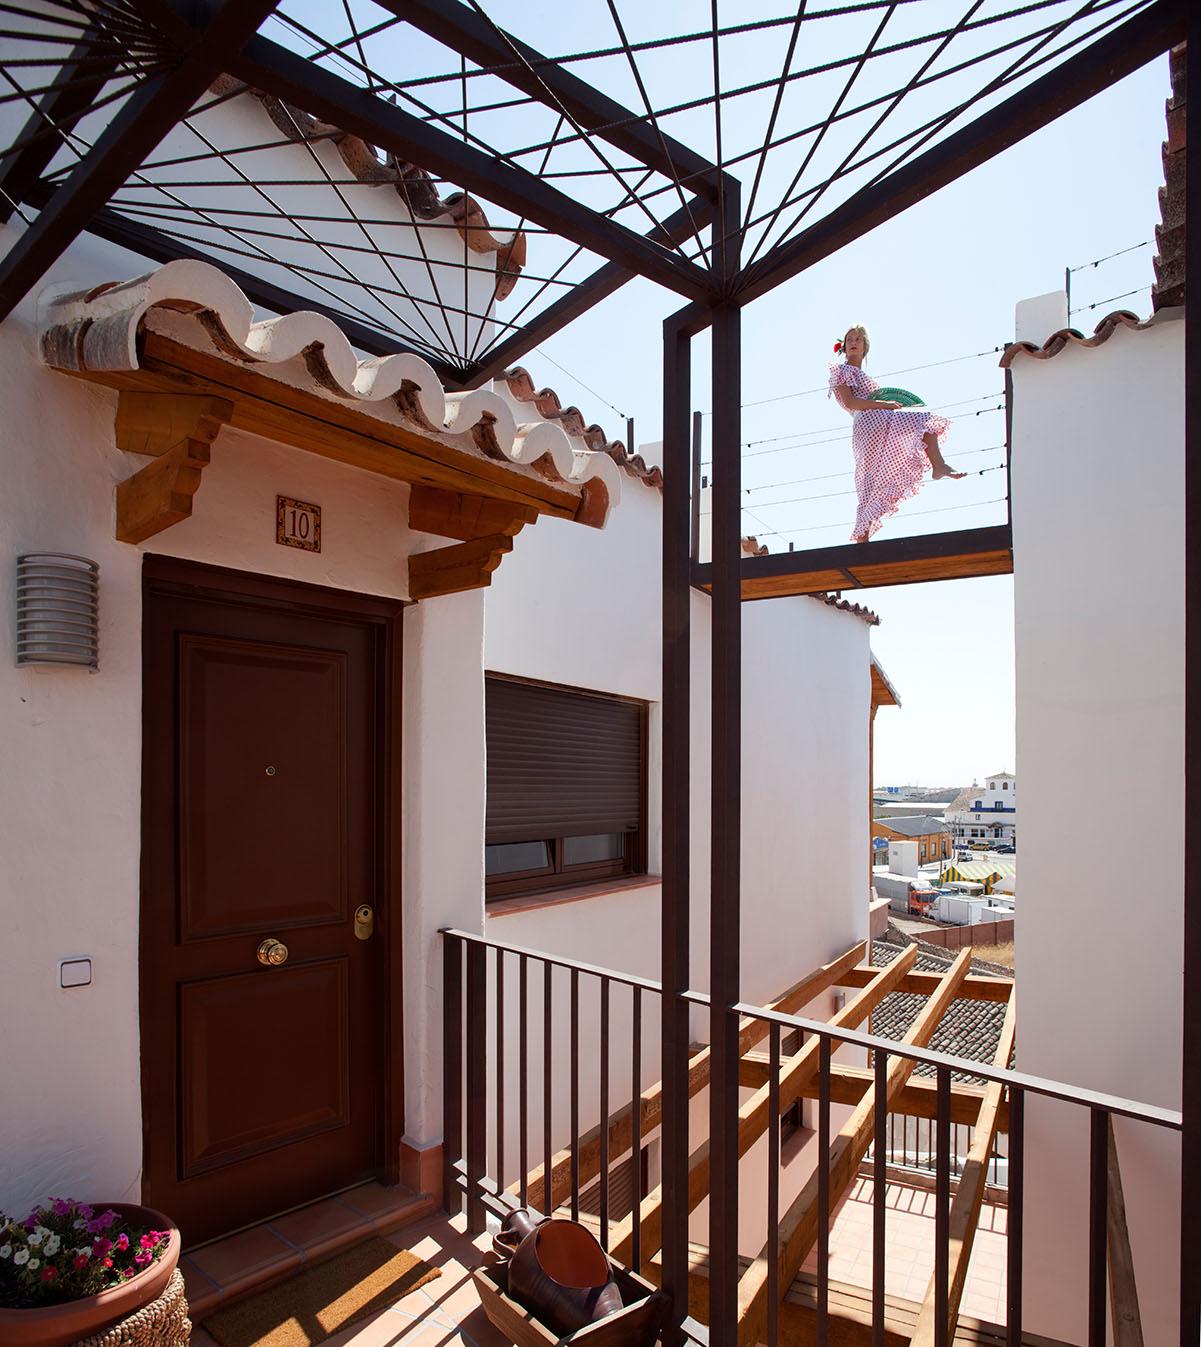 Ocaña de España - Manuel Ocaña, Arquitectura, Diseño, Vivienda-Colectiva